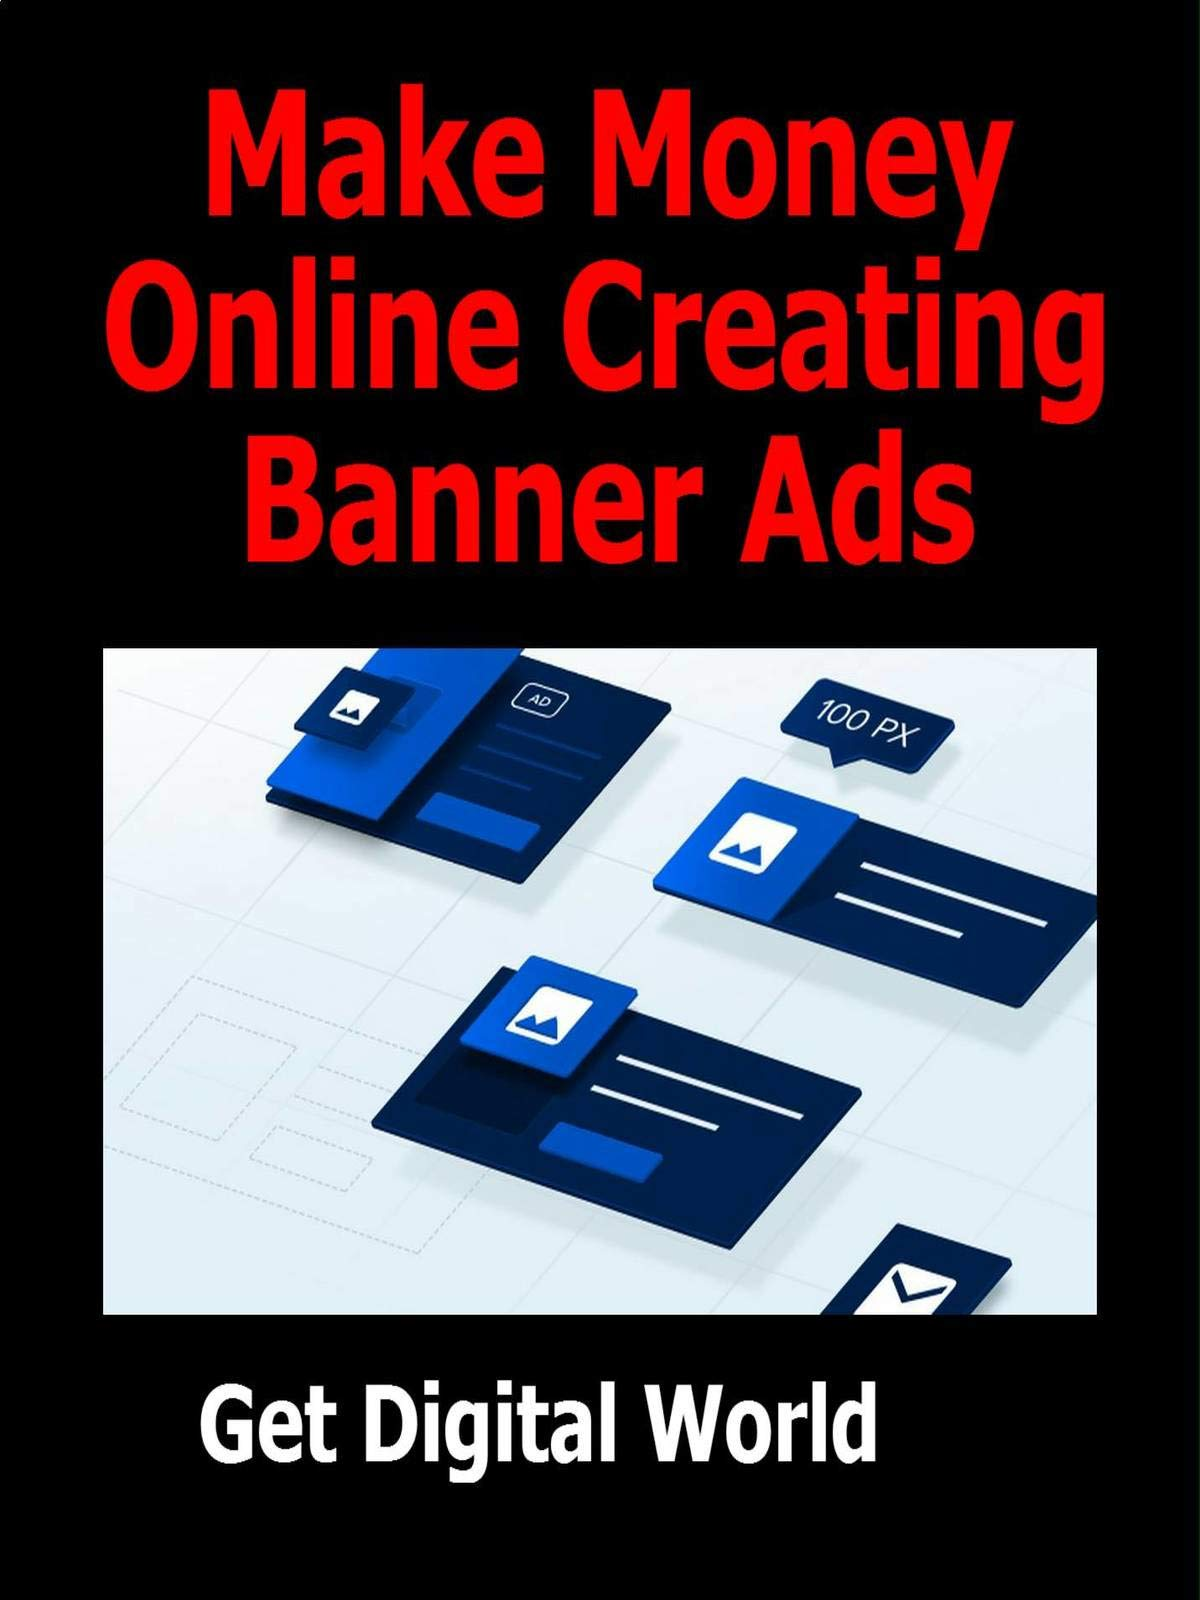 Make Money Online Creating Banner Ads on Amazon Prime Video UK